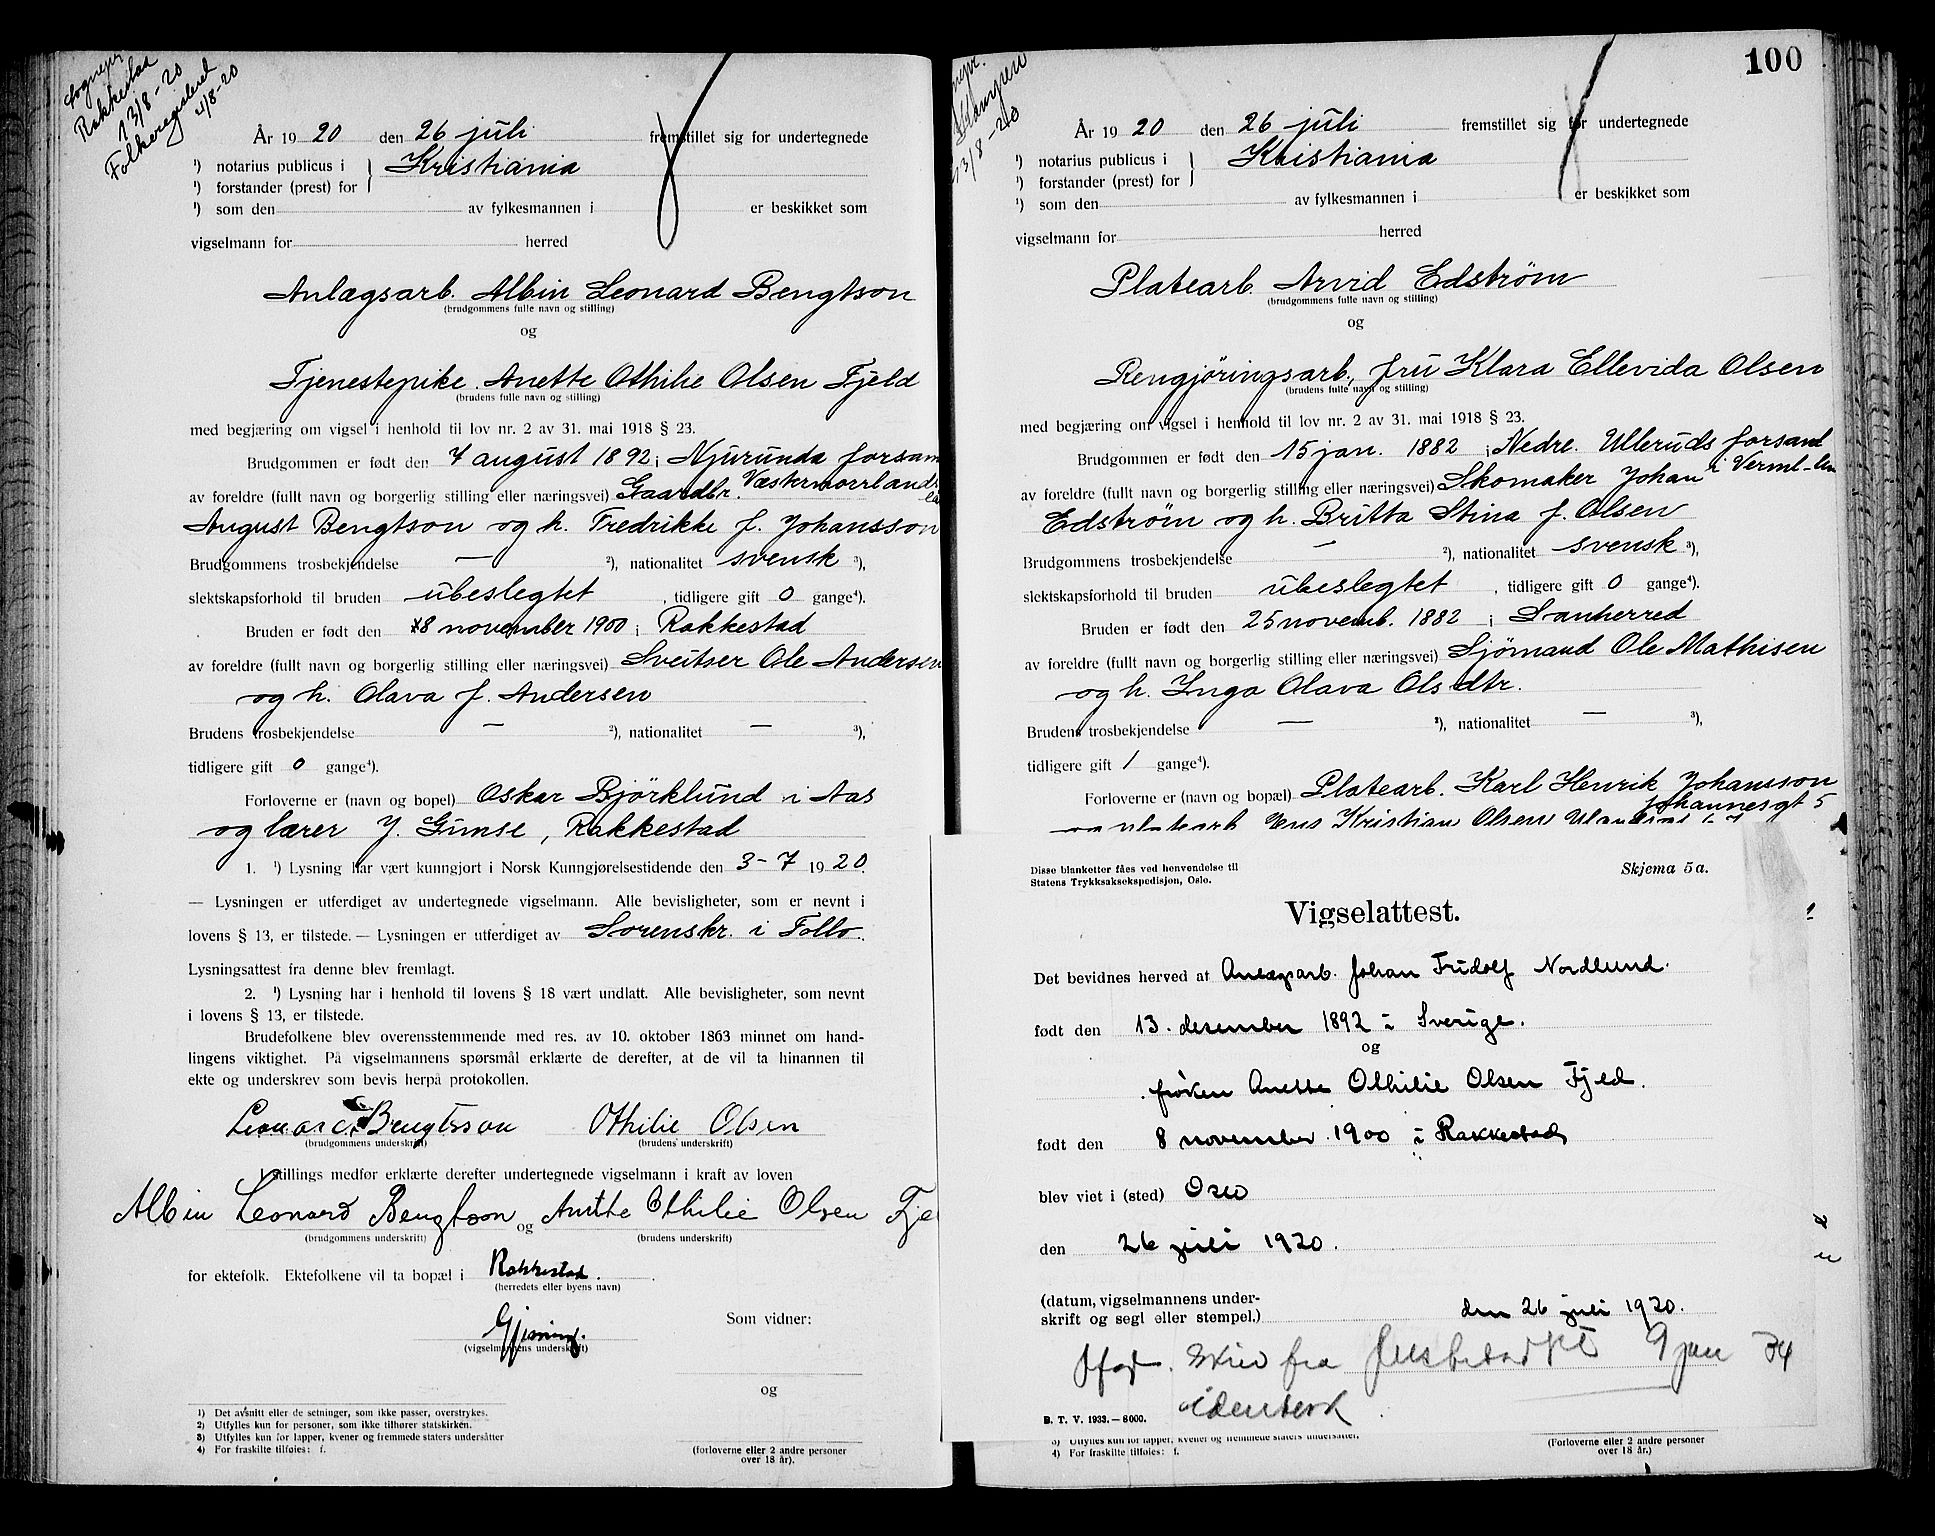 SAO, Oslo byfogd avd. I, L/Lb/Lbb/L0014: Notarialprotokoll, rekke II: Vigsler, 1920-1921, s. 99b-100a